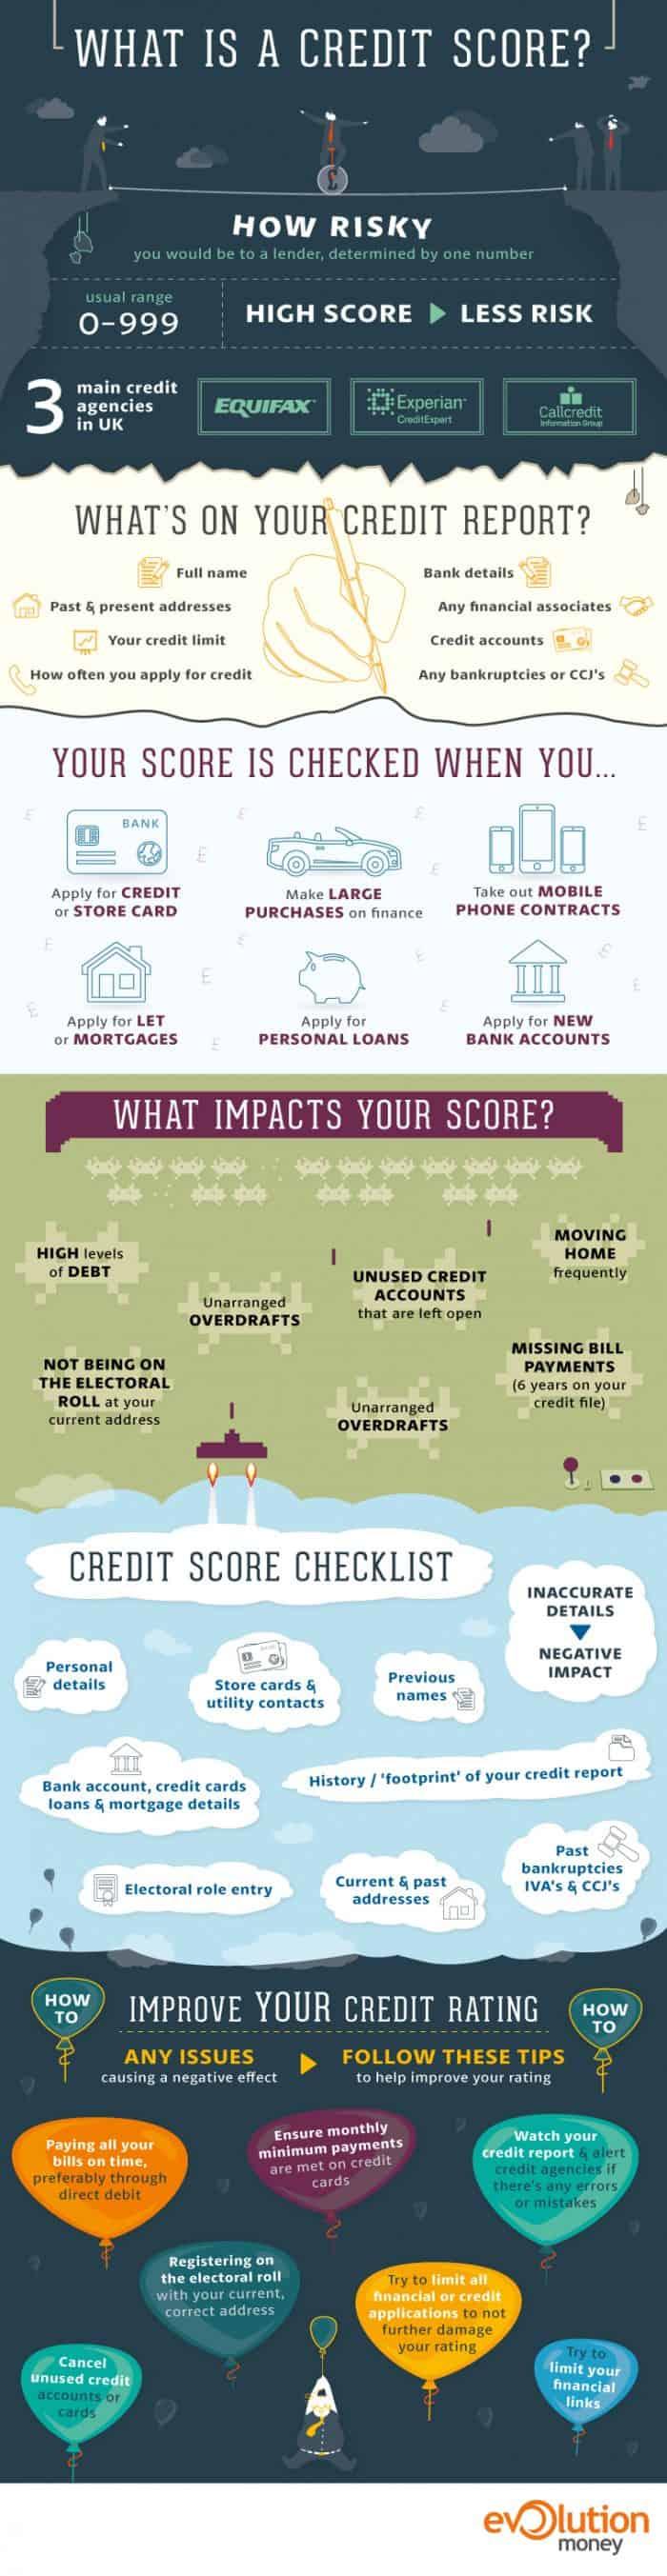 Credit Score Infographic